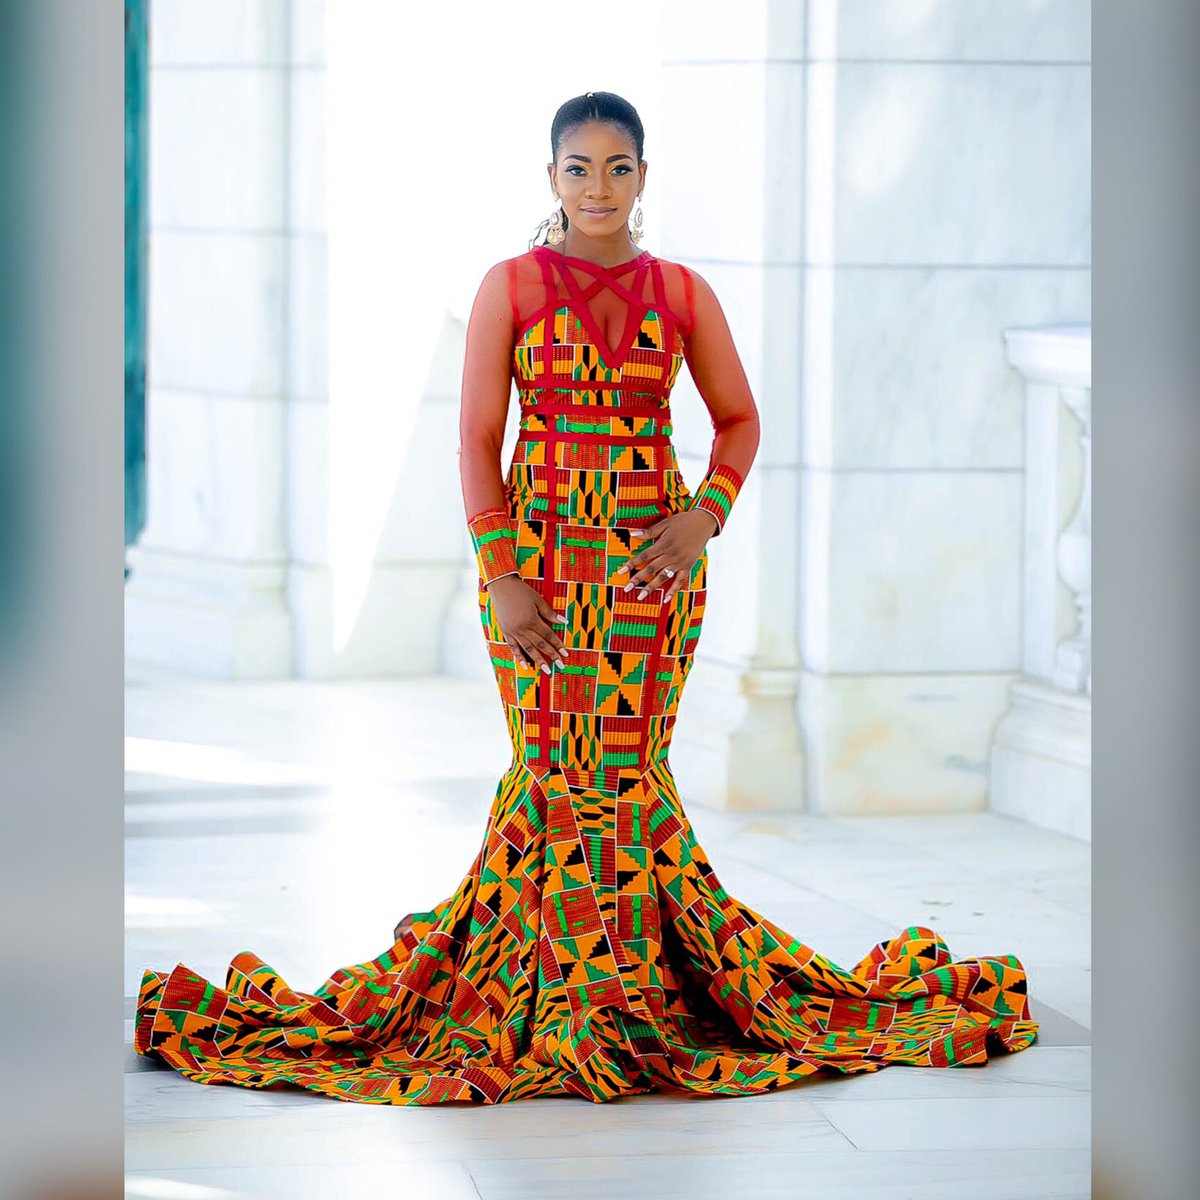 Image result for kente dress hashtags